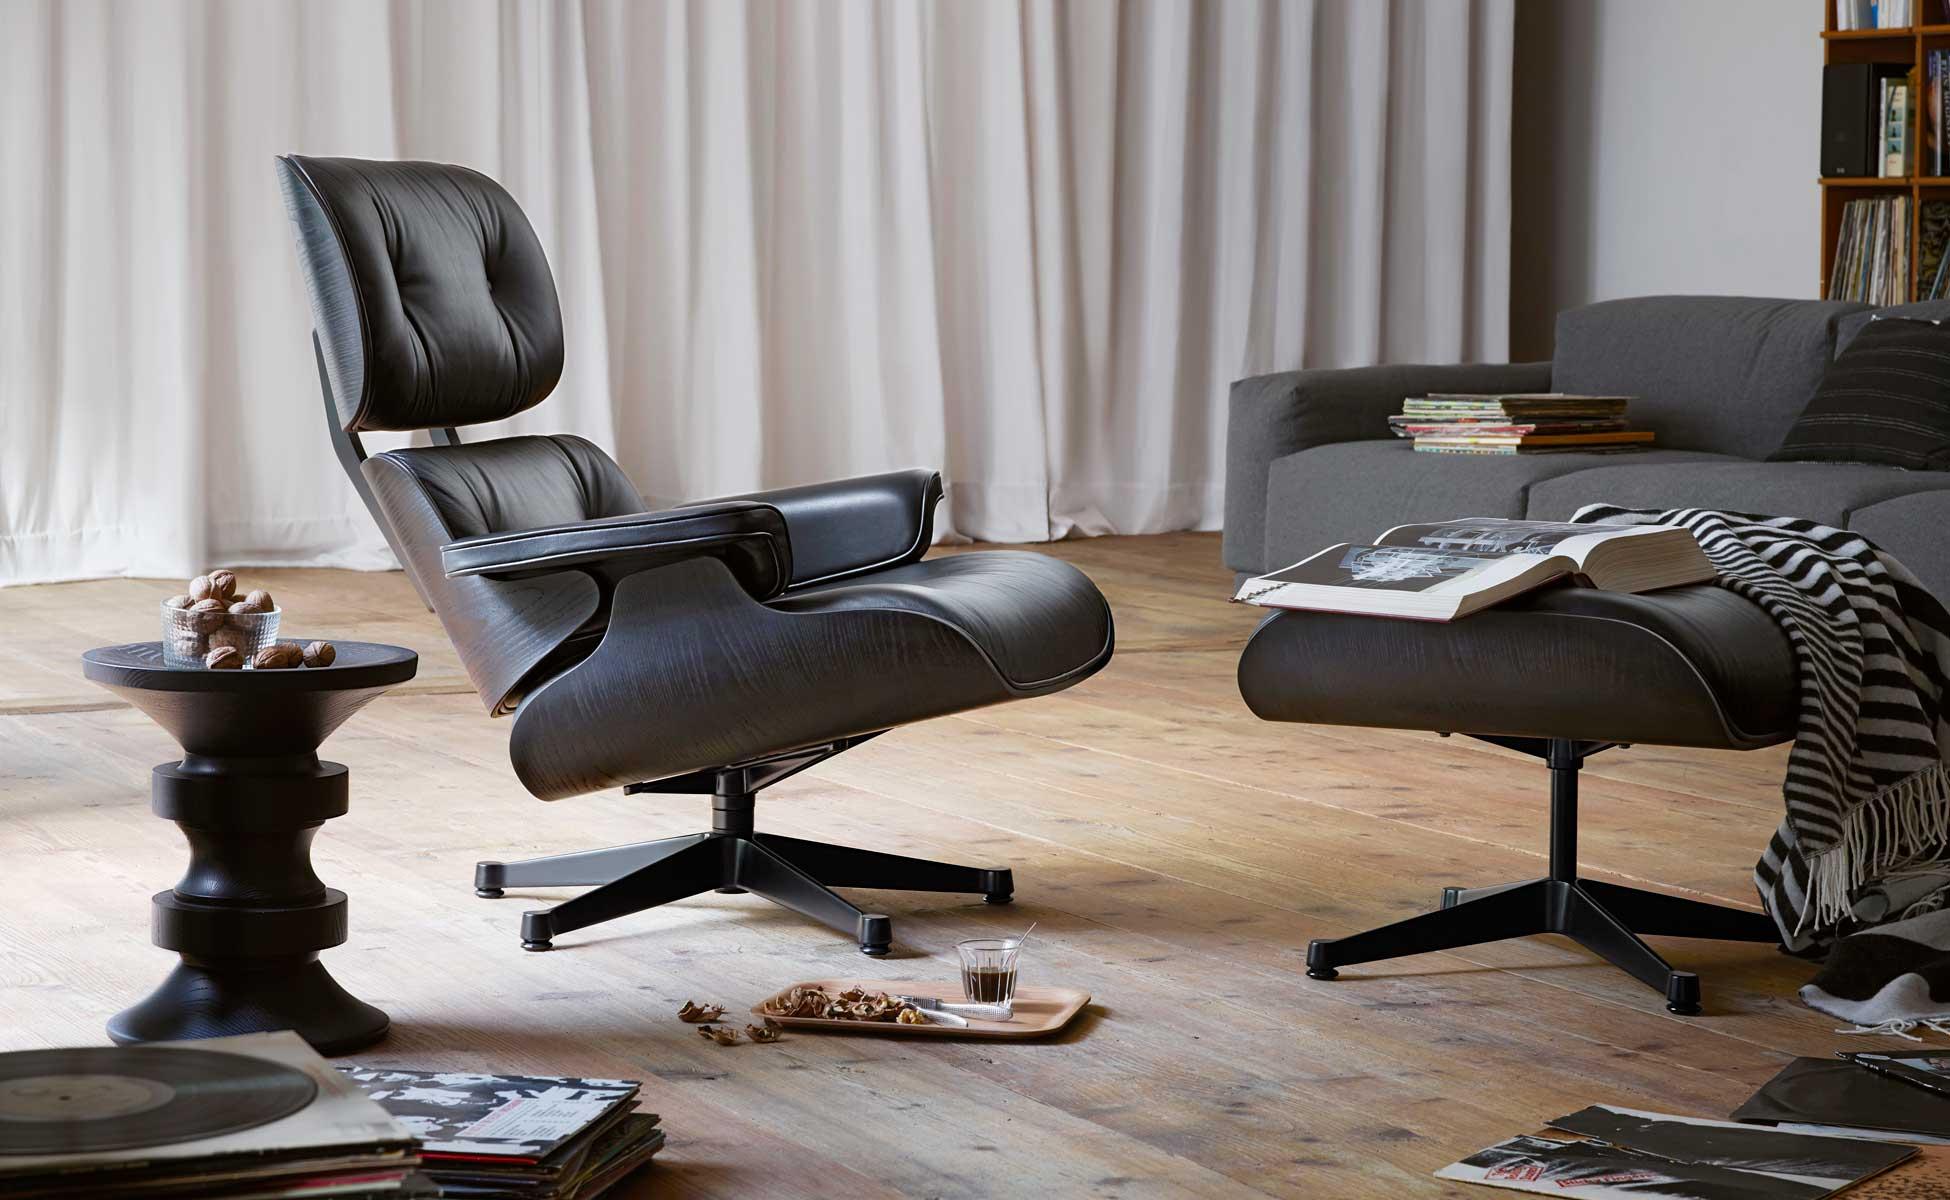 Poltrona eames replica: eames lounge chair and ottoman bauhaus italy